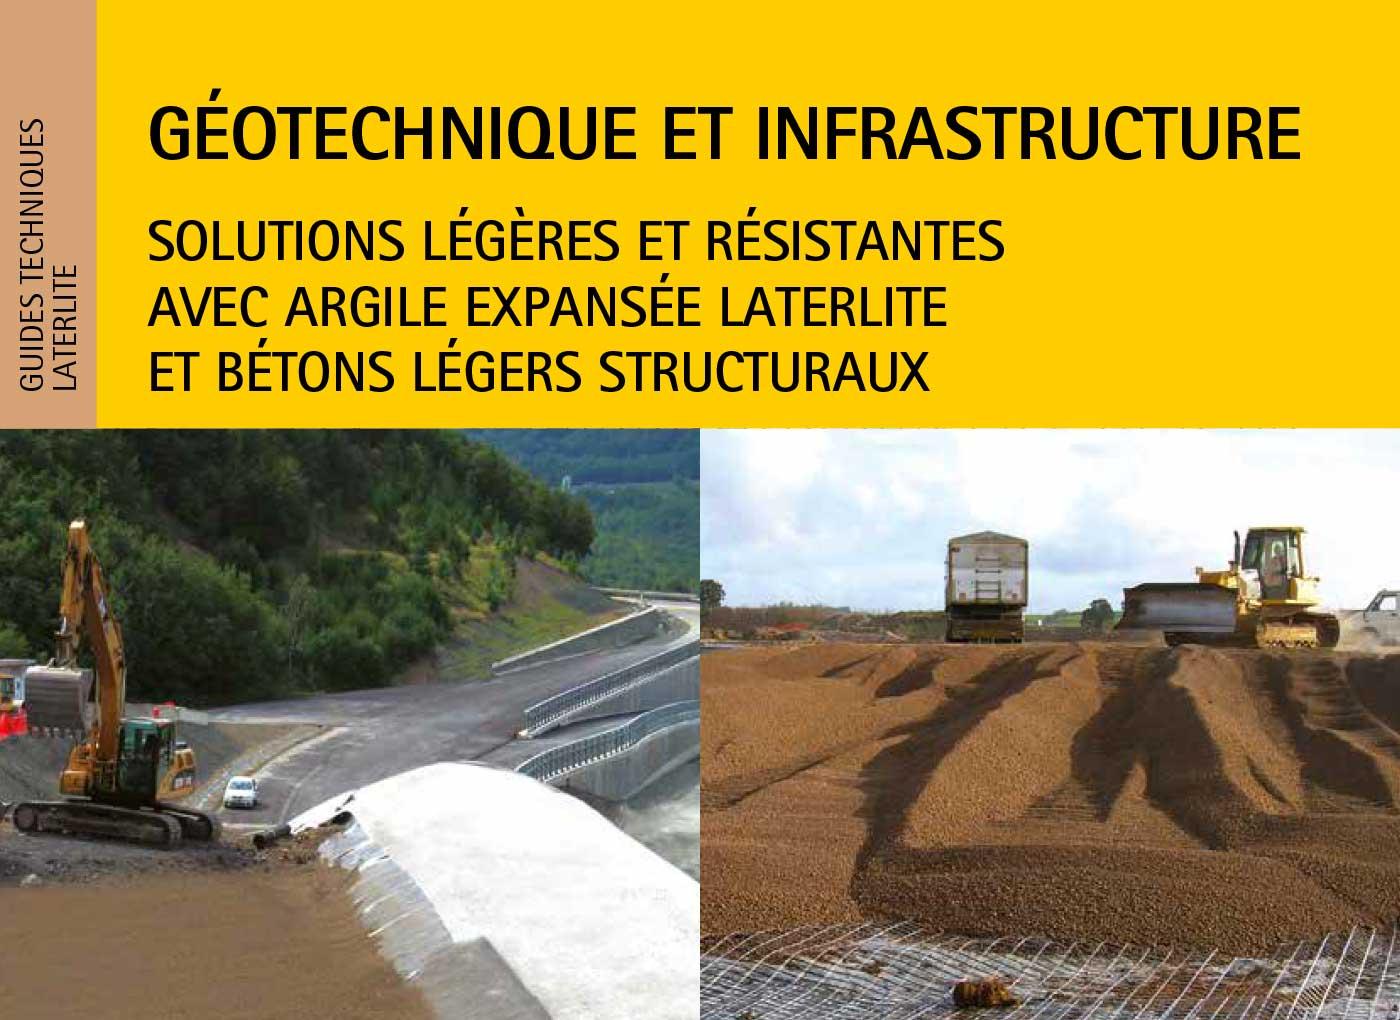 geotechnique-et-infrastructure-fr